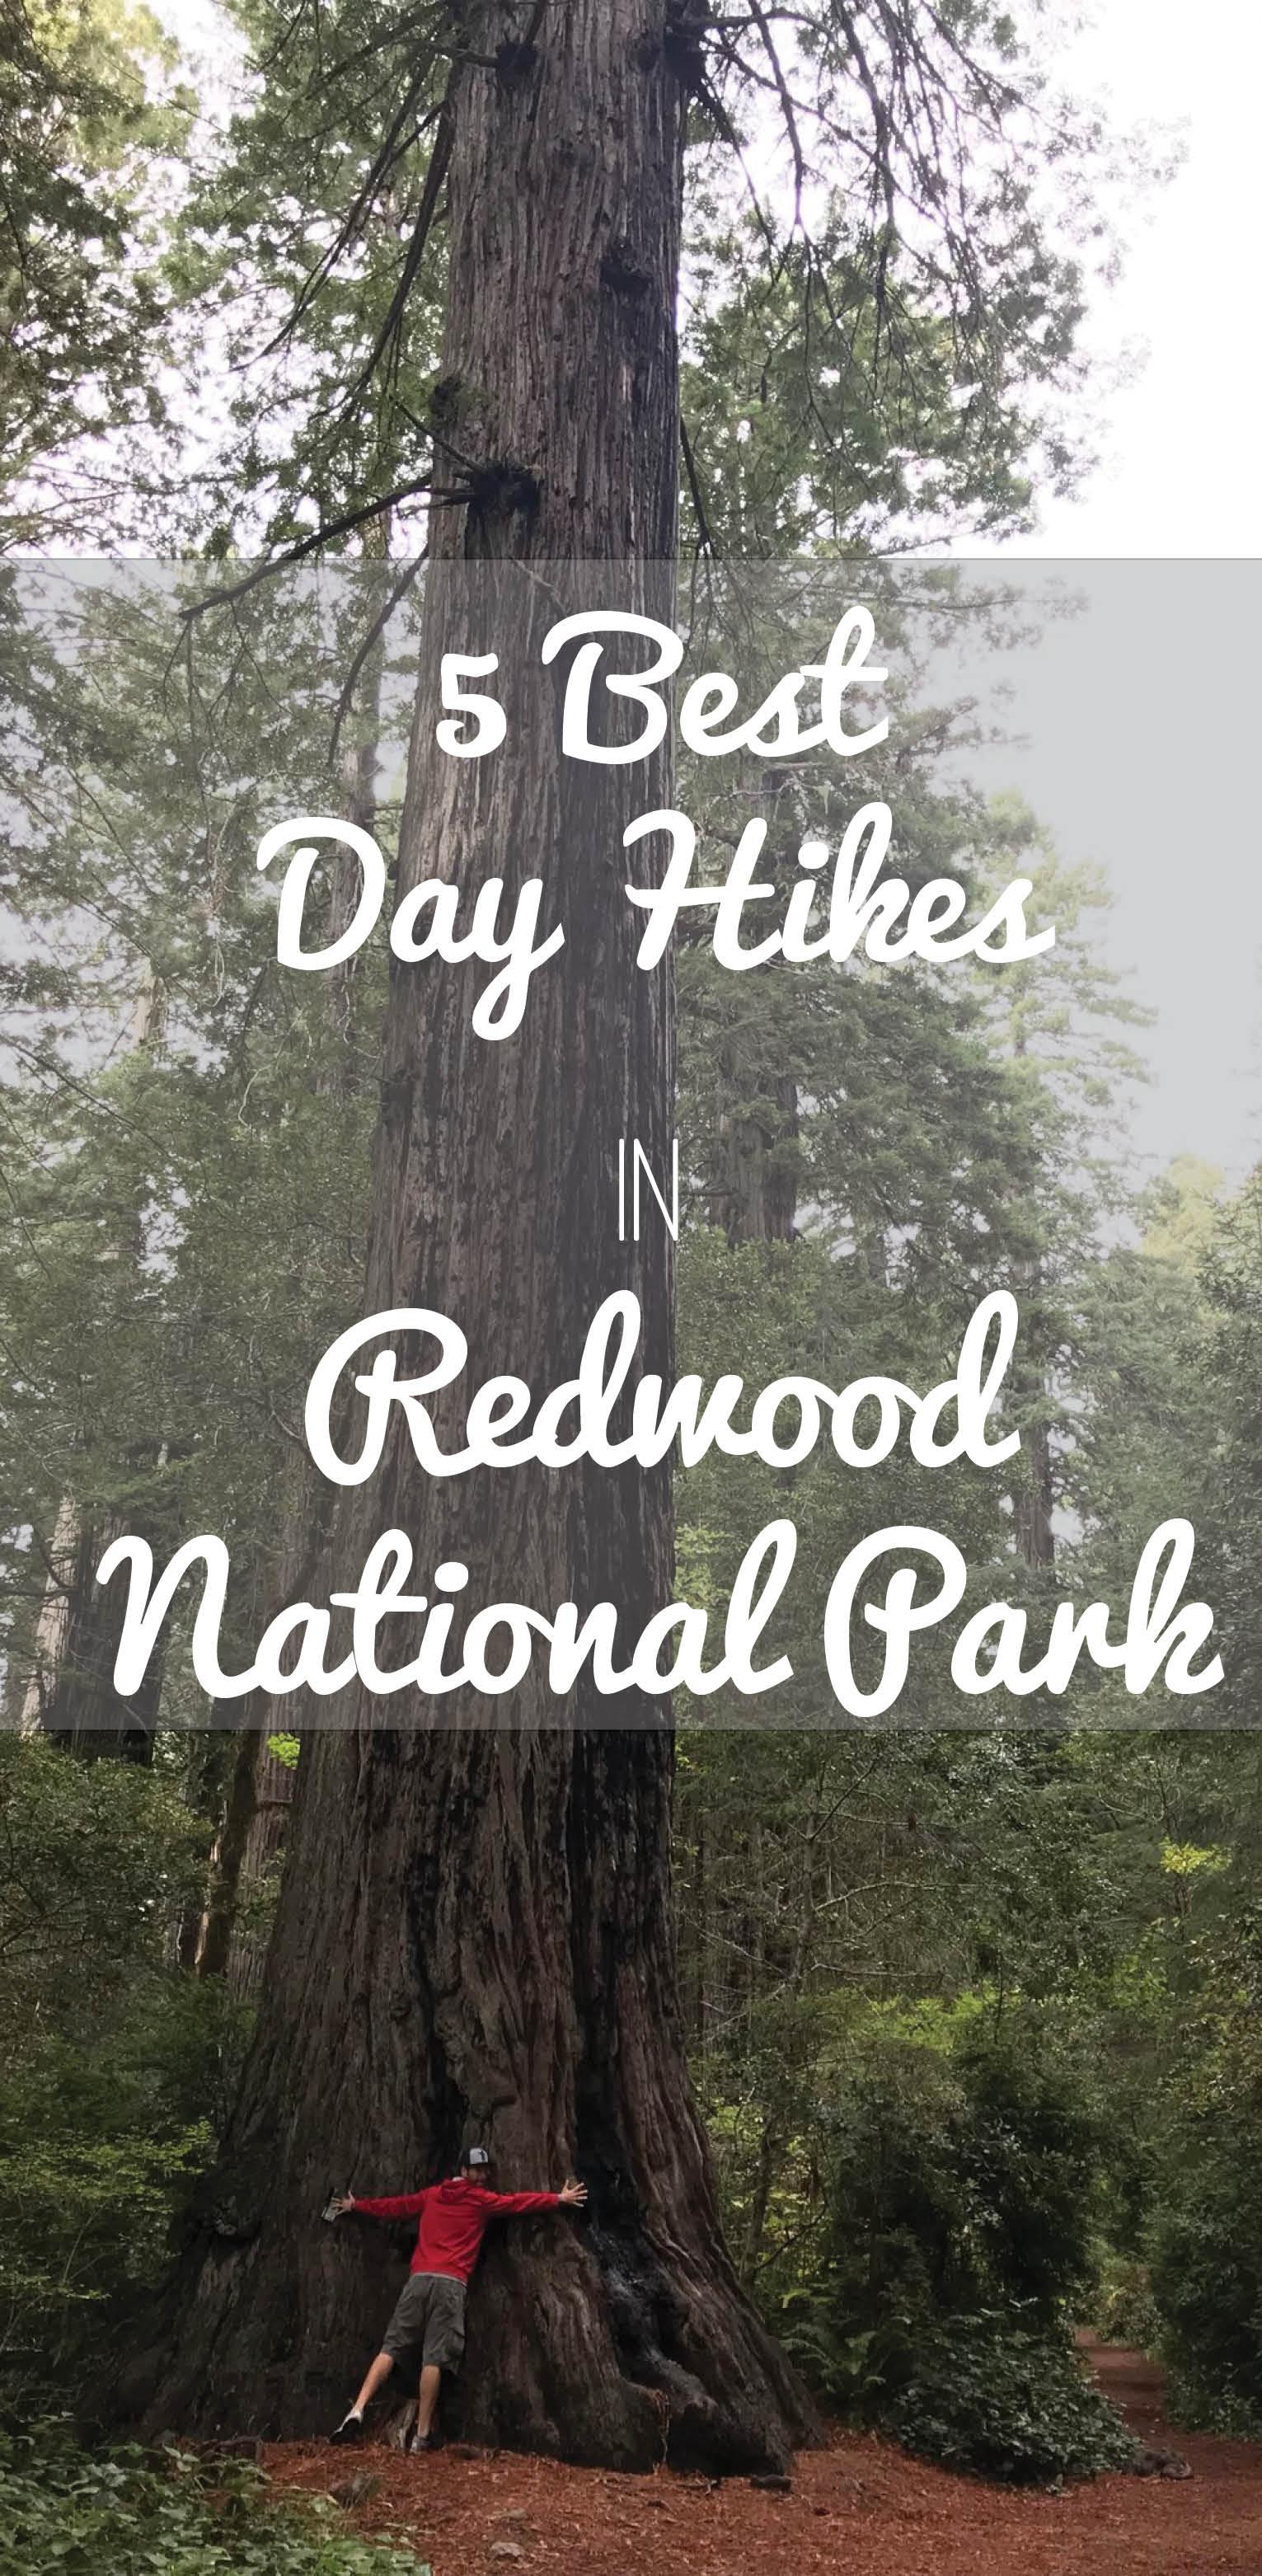 Best Day Hikes in Redwood.jpg